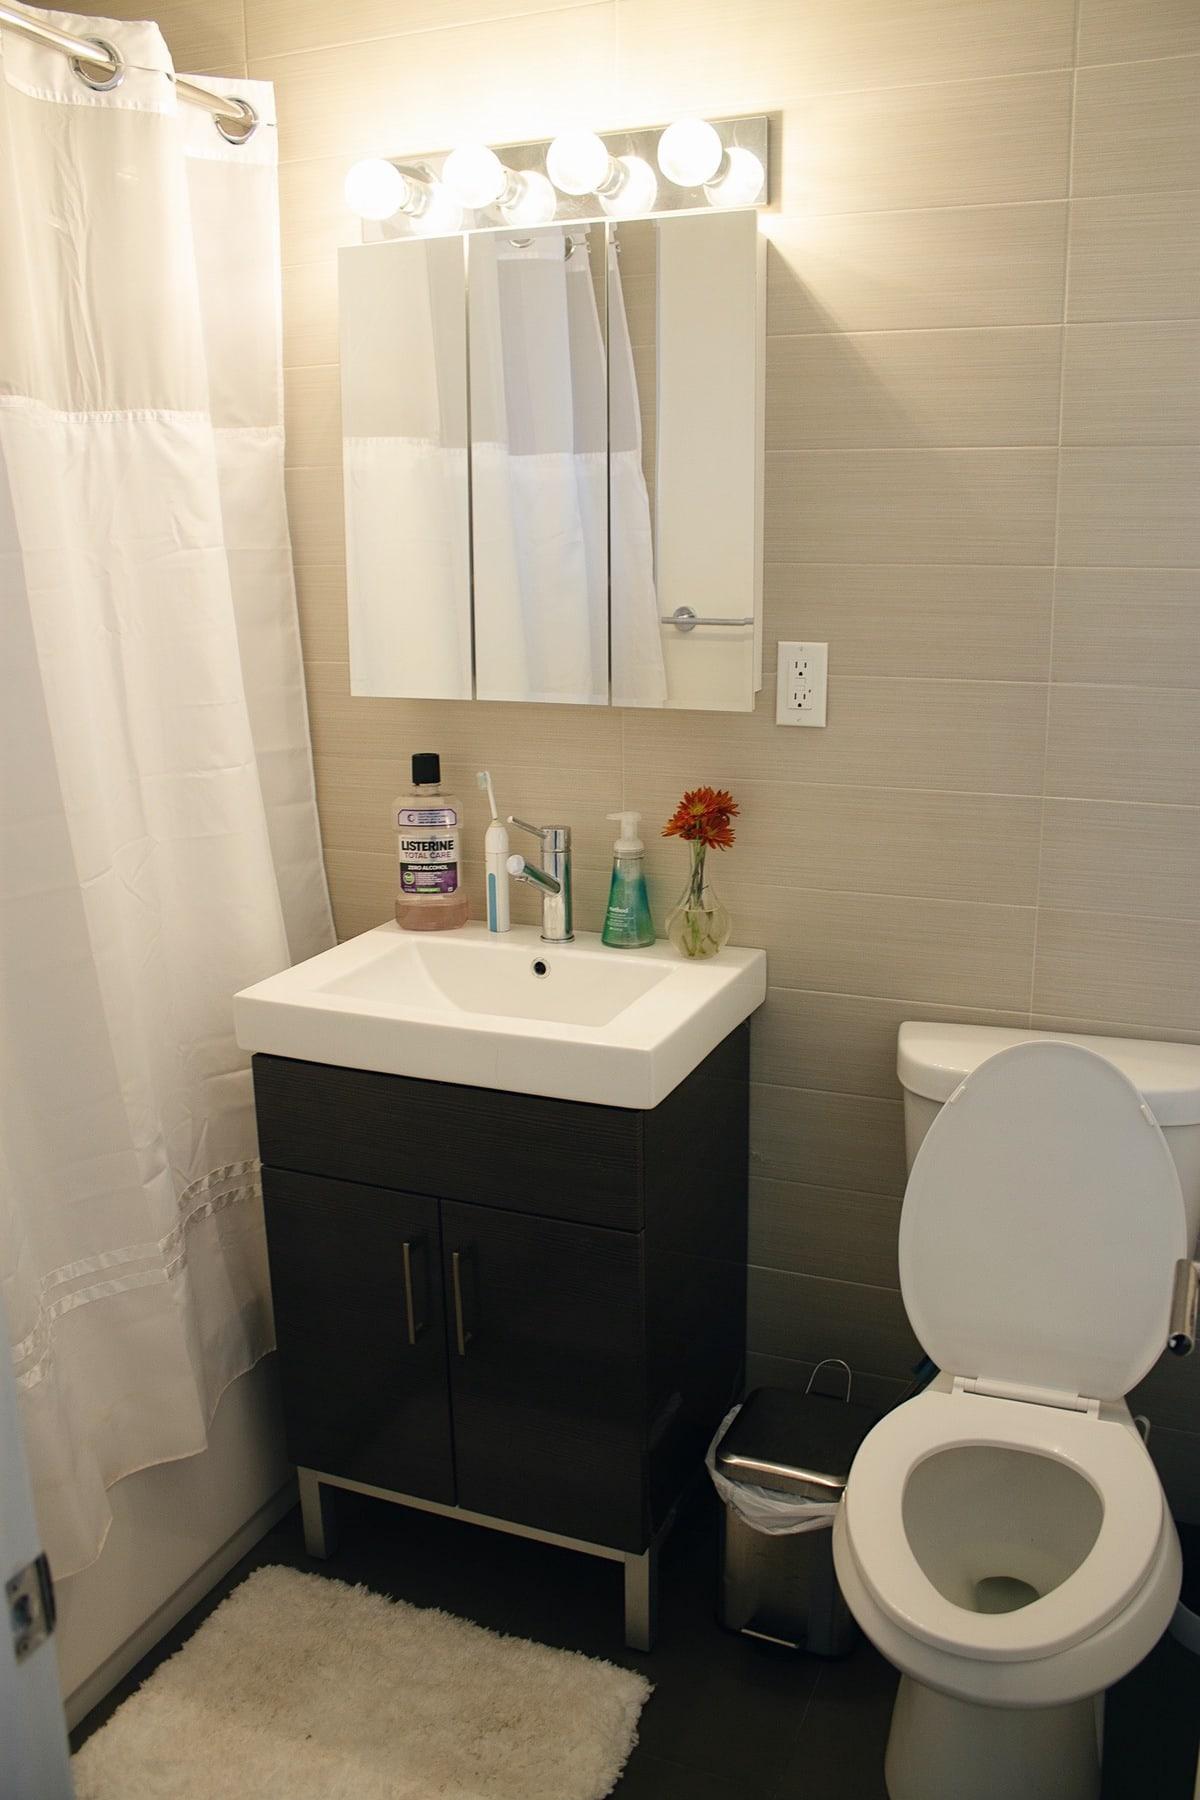 Bathroom for apartment tour